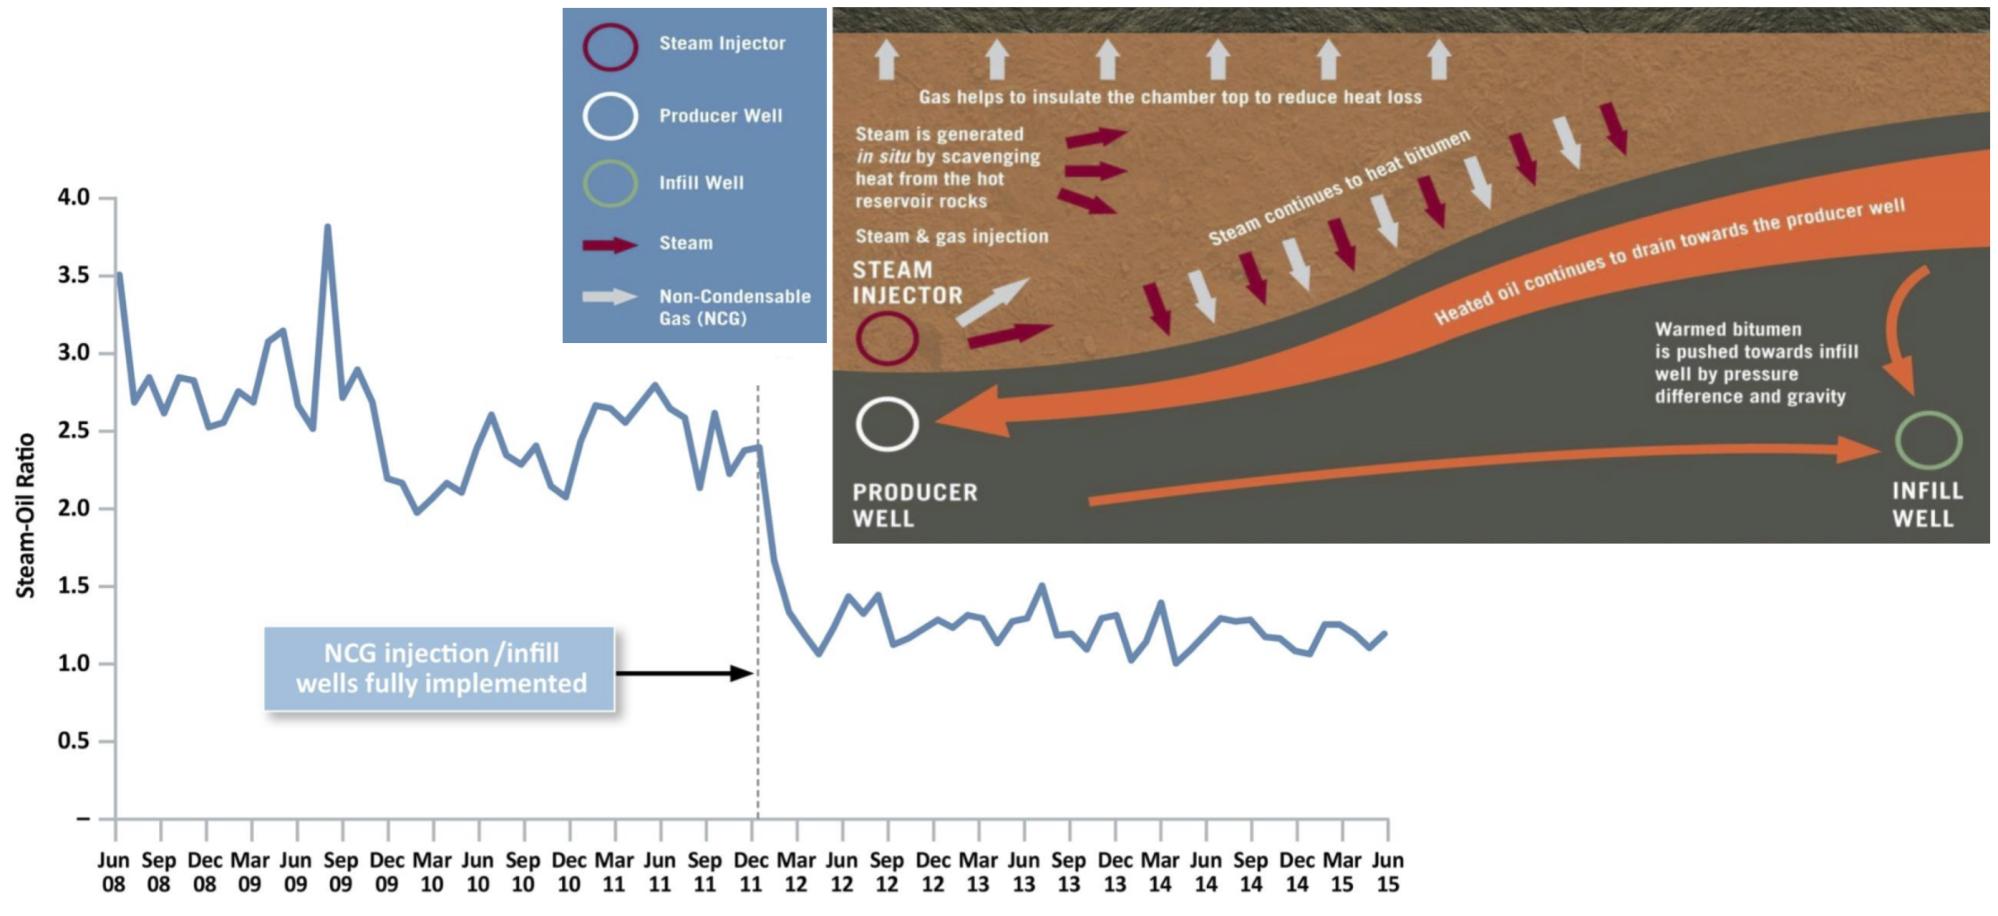 PHASE 1 EMSAGP PERFORMANCE: STEAM INJECTION REDUCED BY 55% POST EMSAGP AT CHRISTINA LAKE